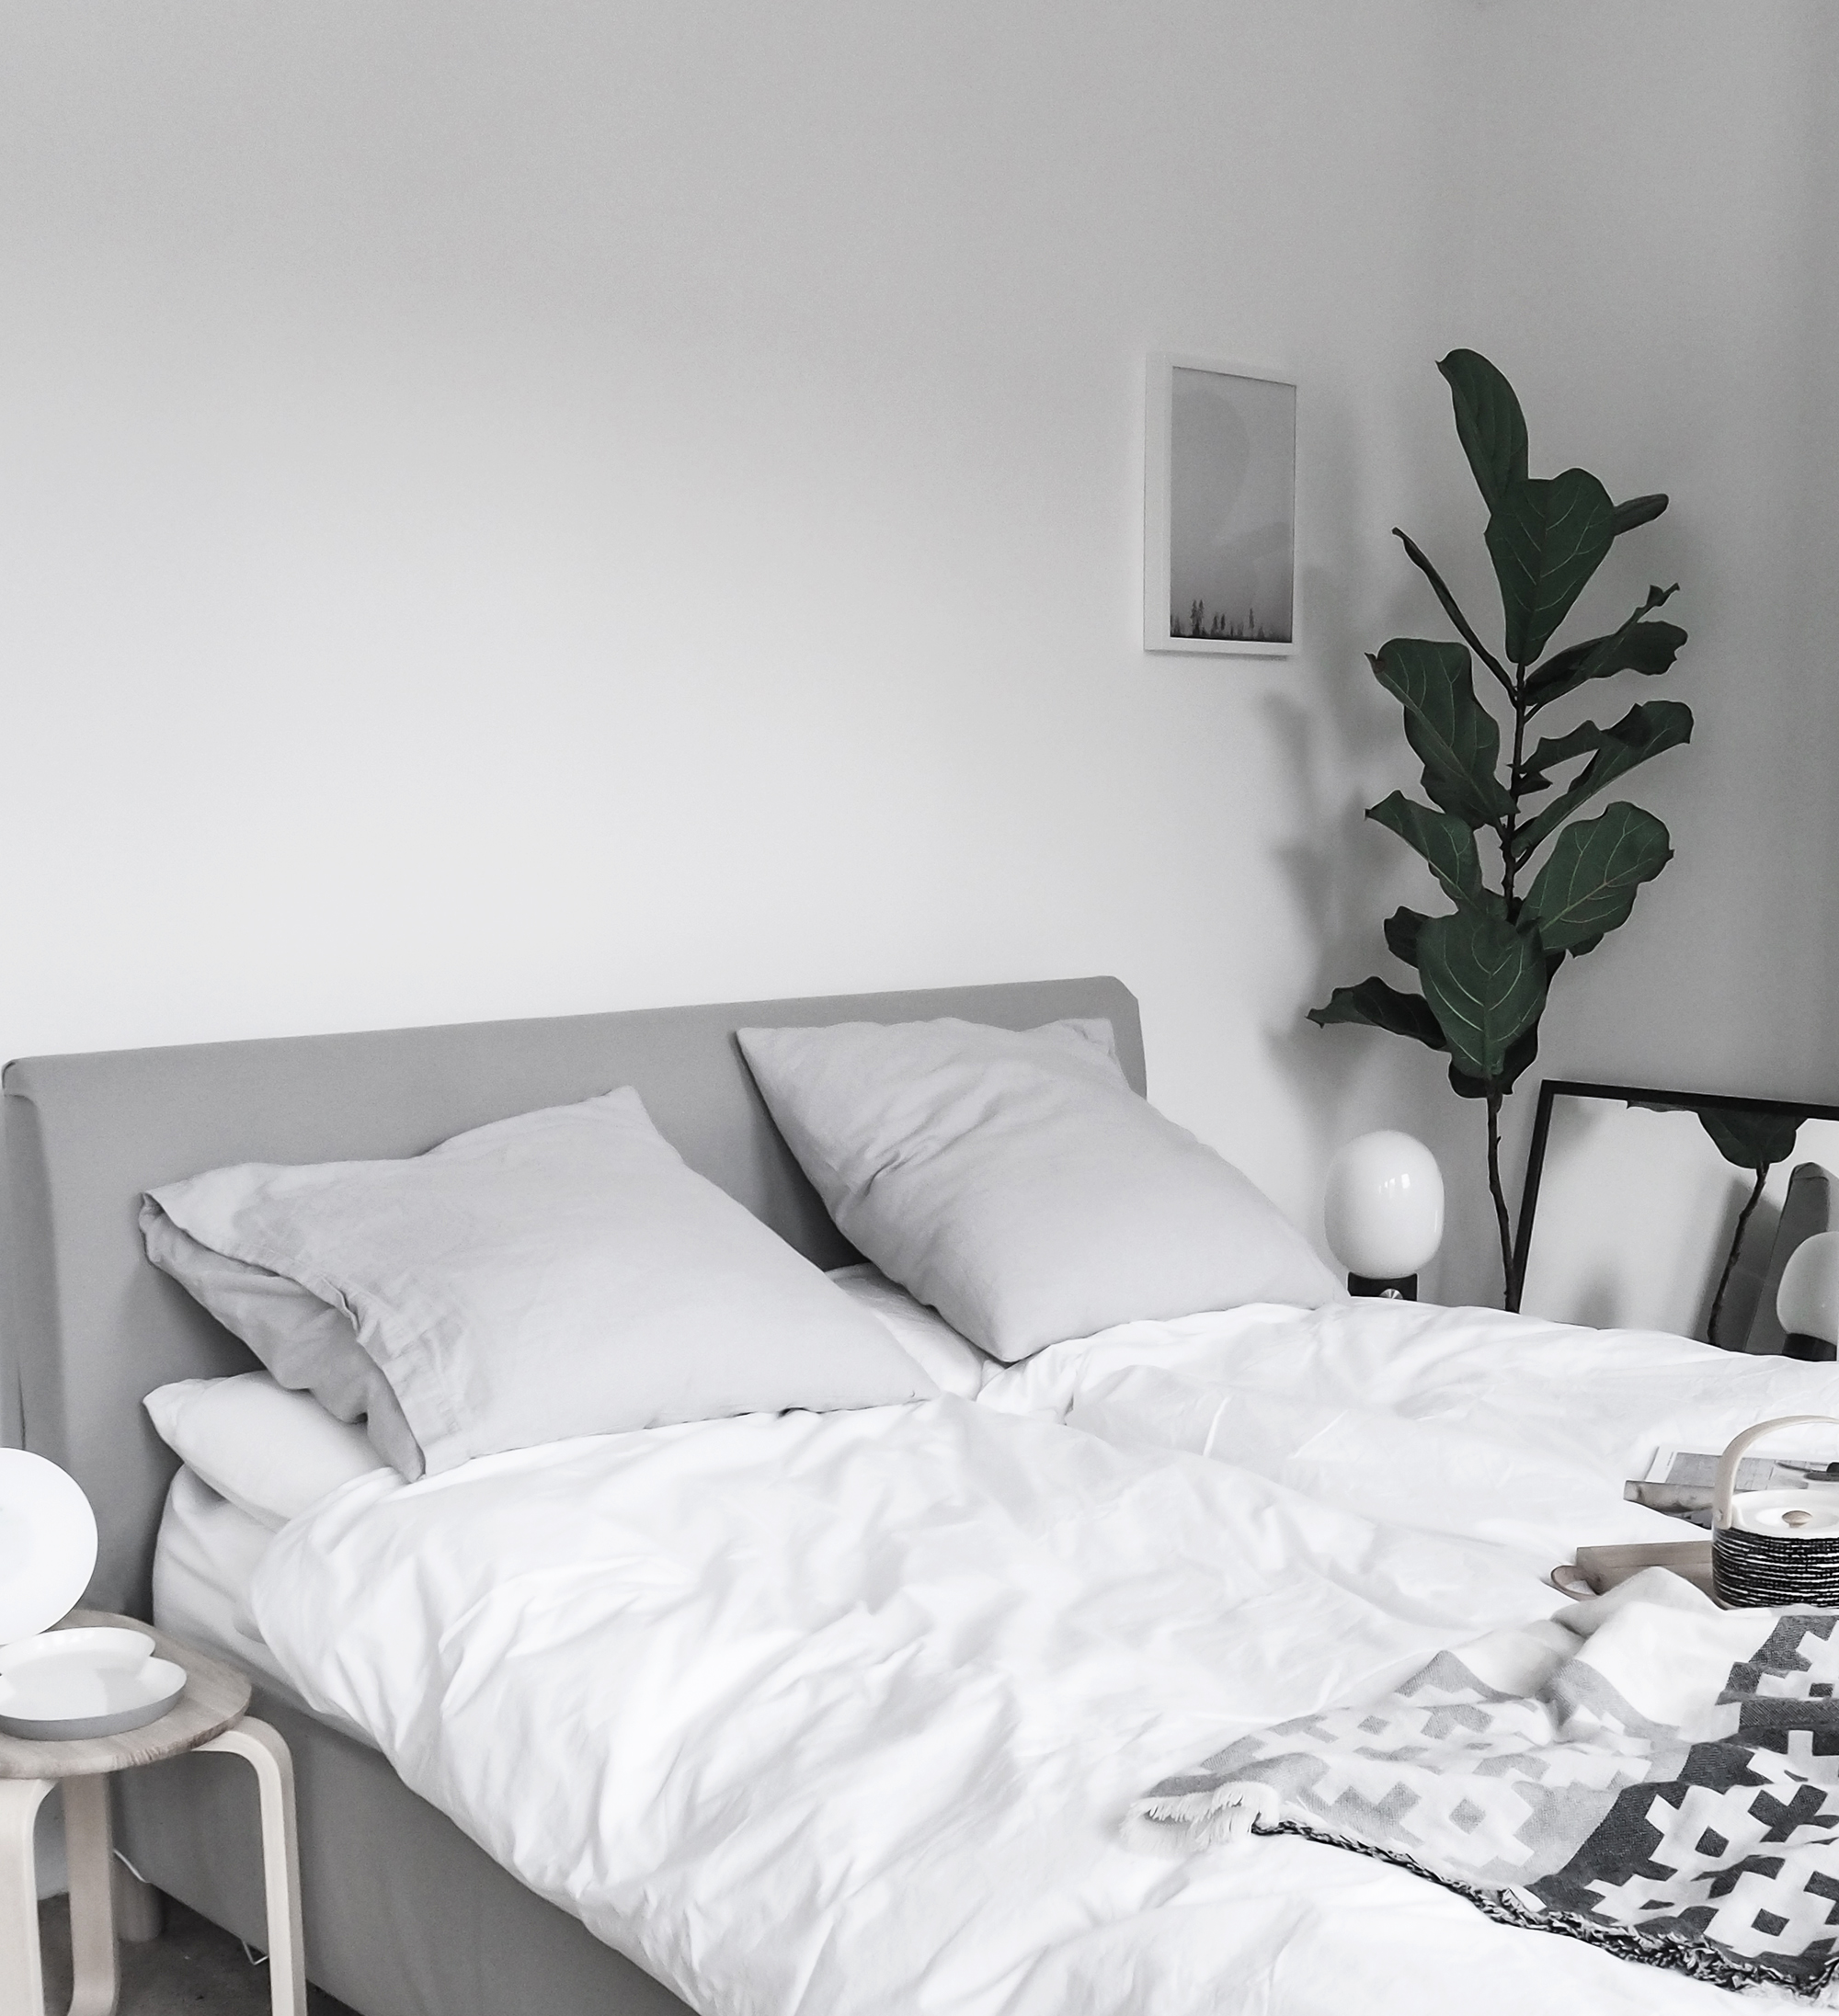 Eve Sleep | Sleep the Scandinavian way, Hannah in the house